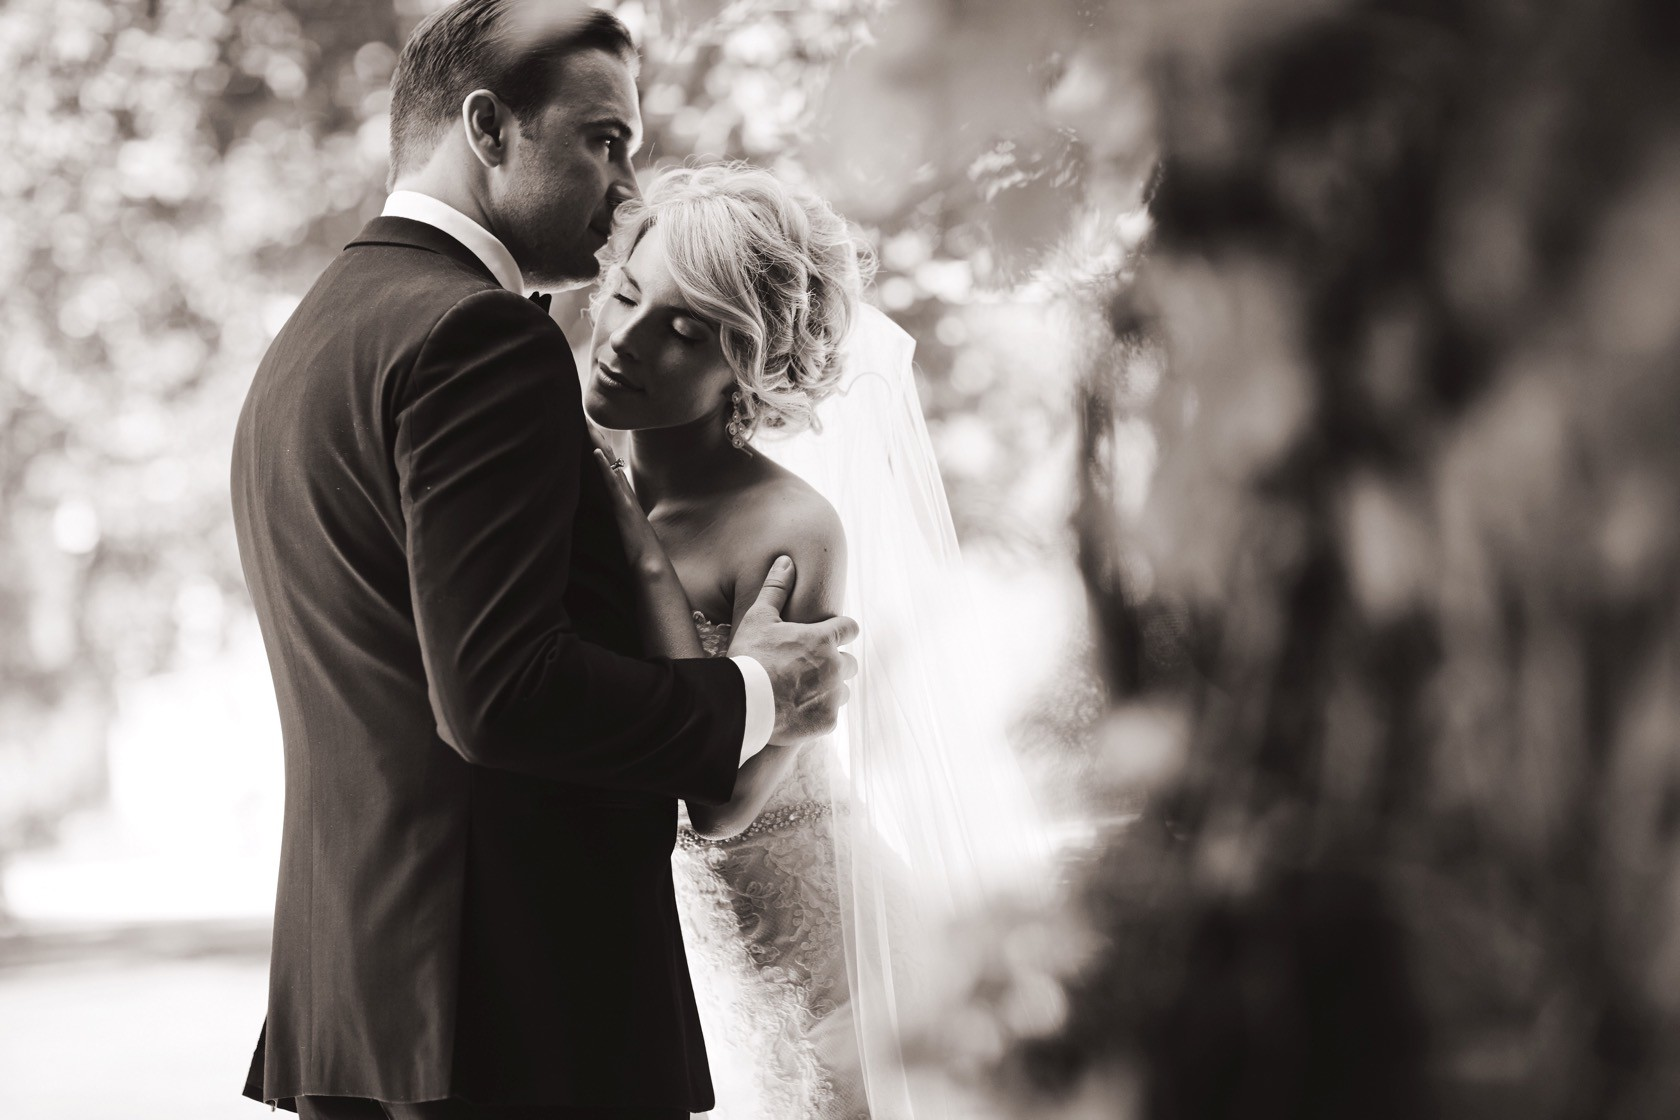 stephen sager photography 0009 fine art wedding photography